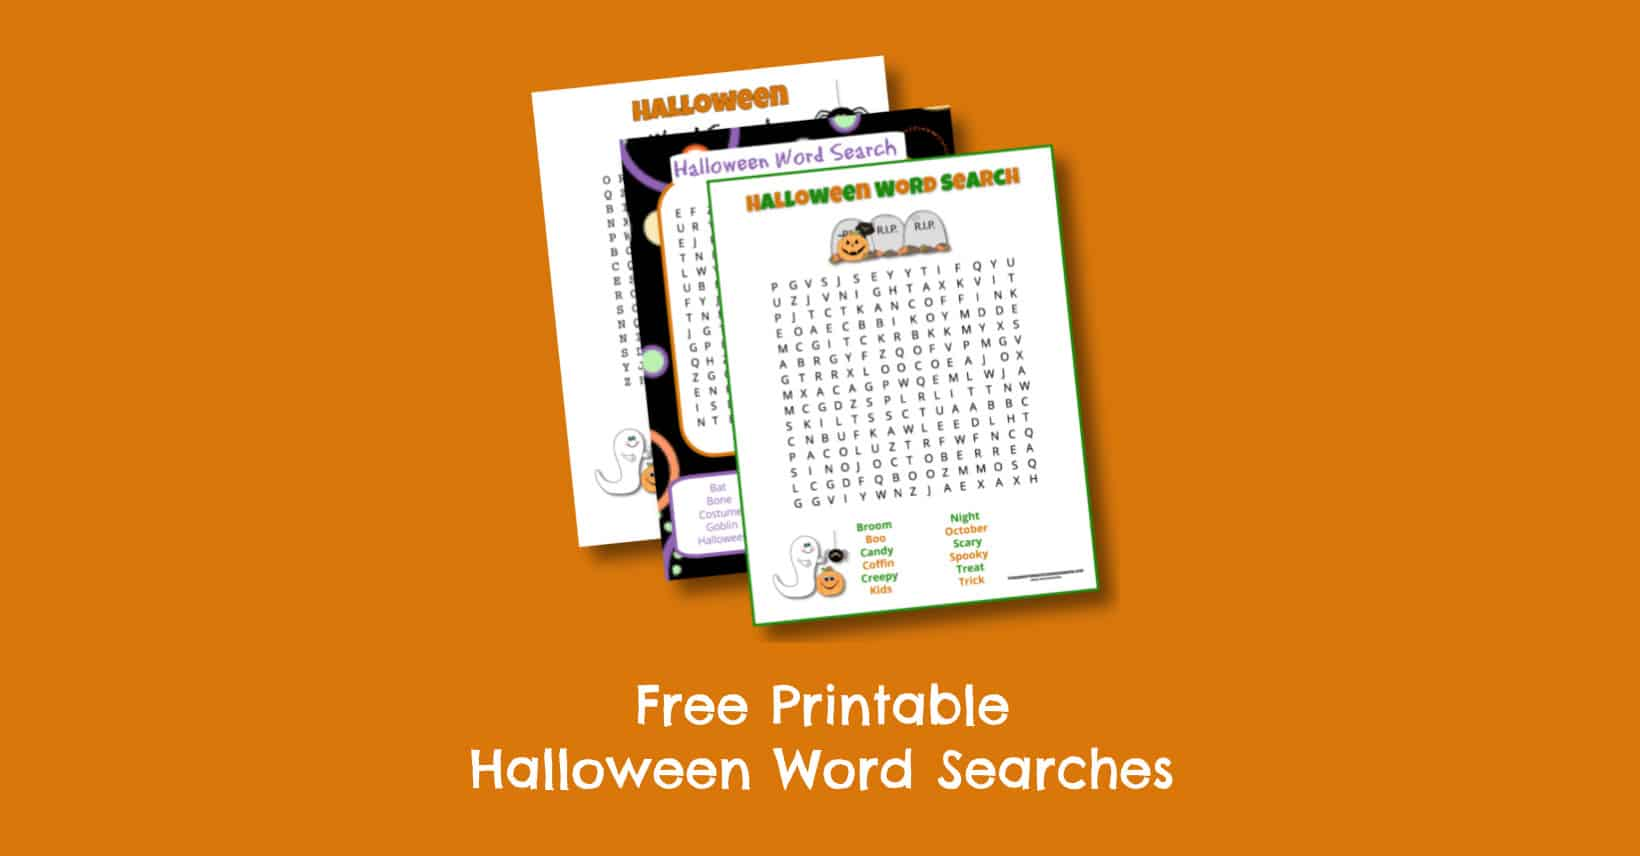 Free Printable Halloween Word Searches